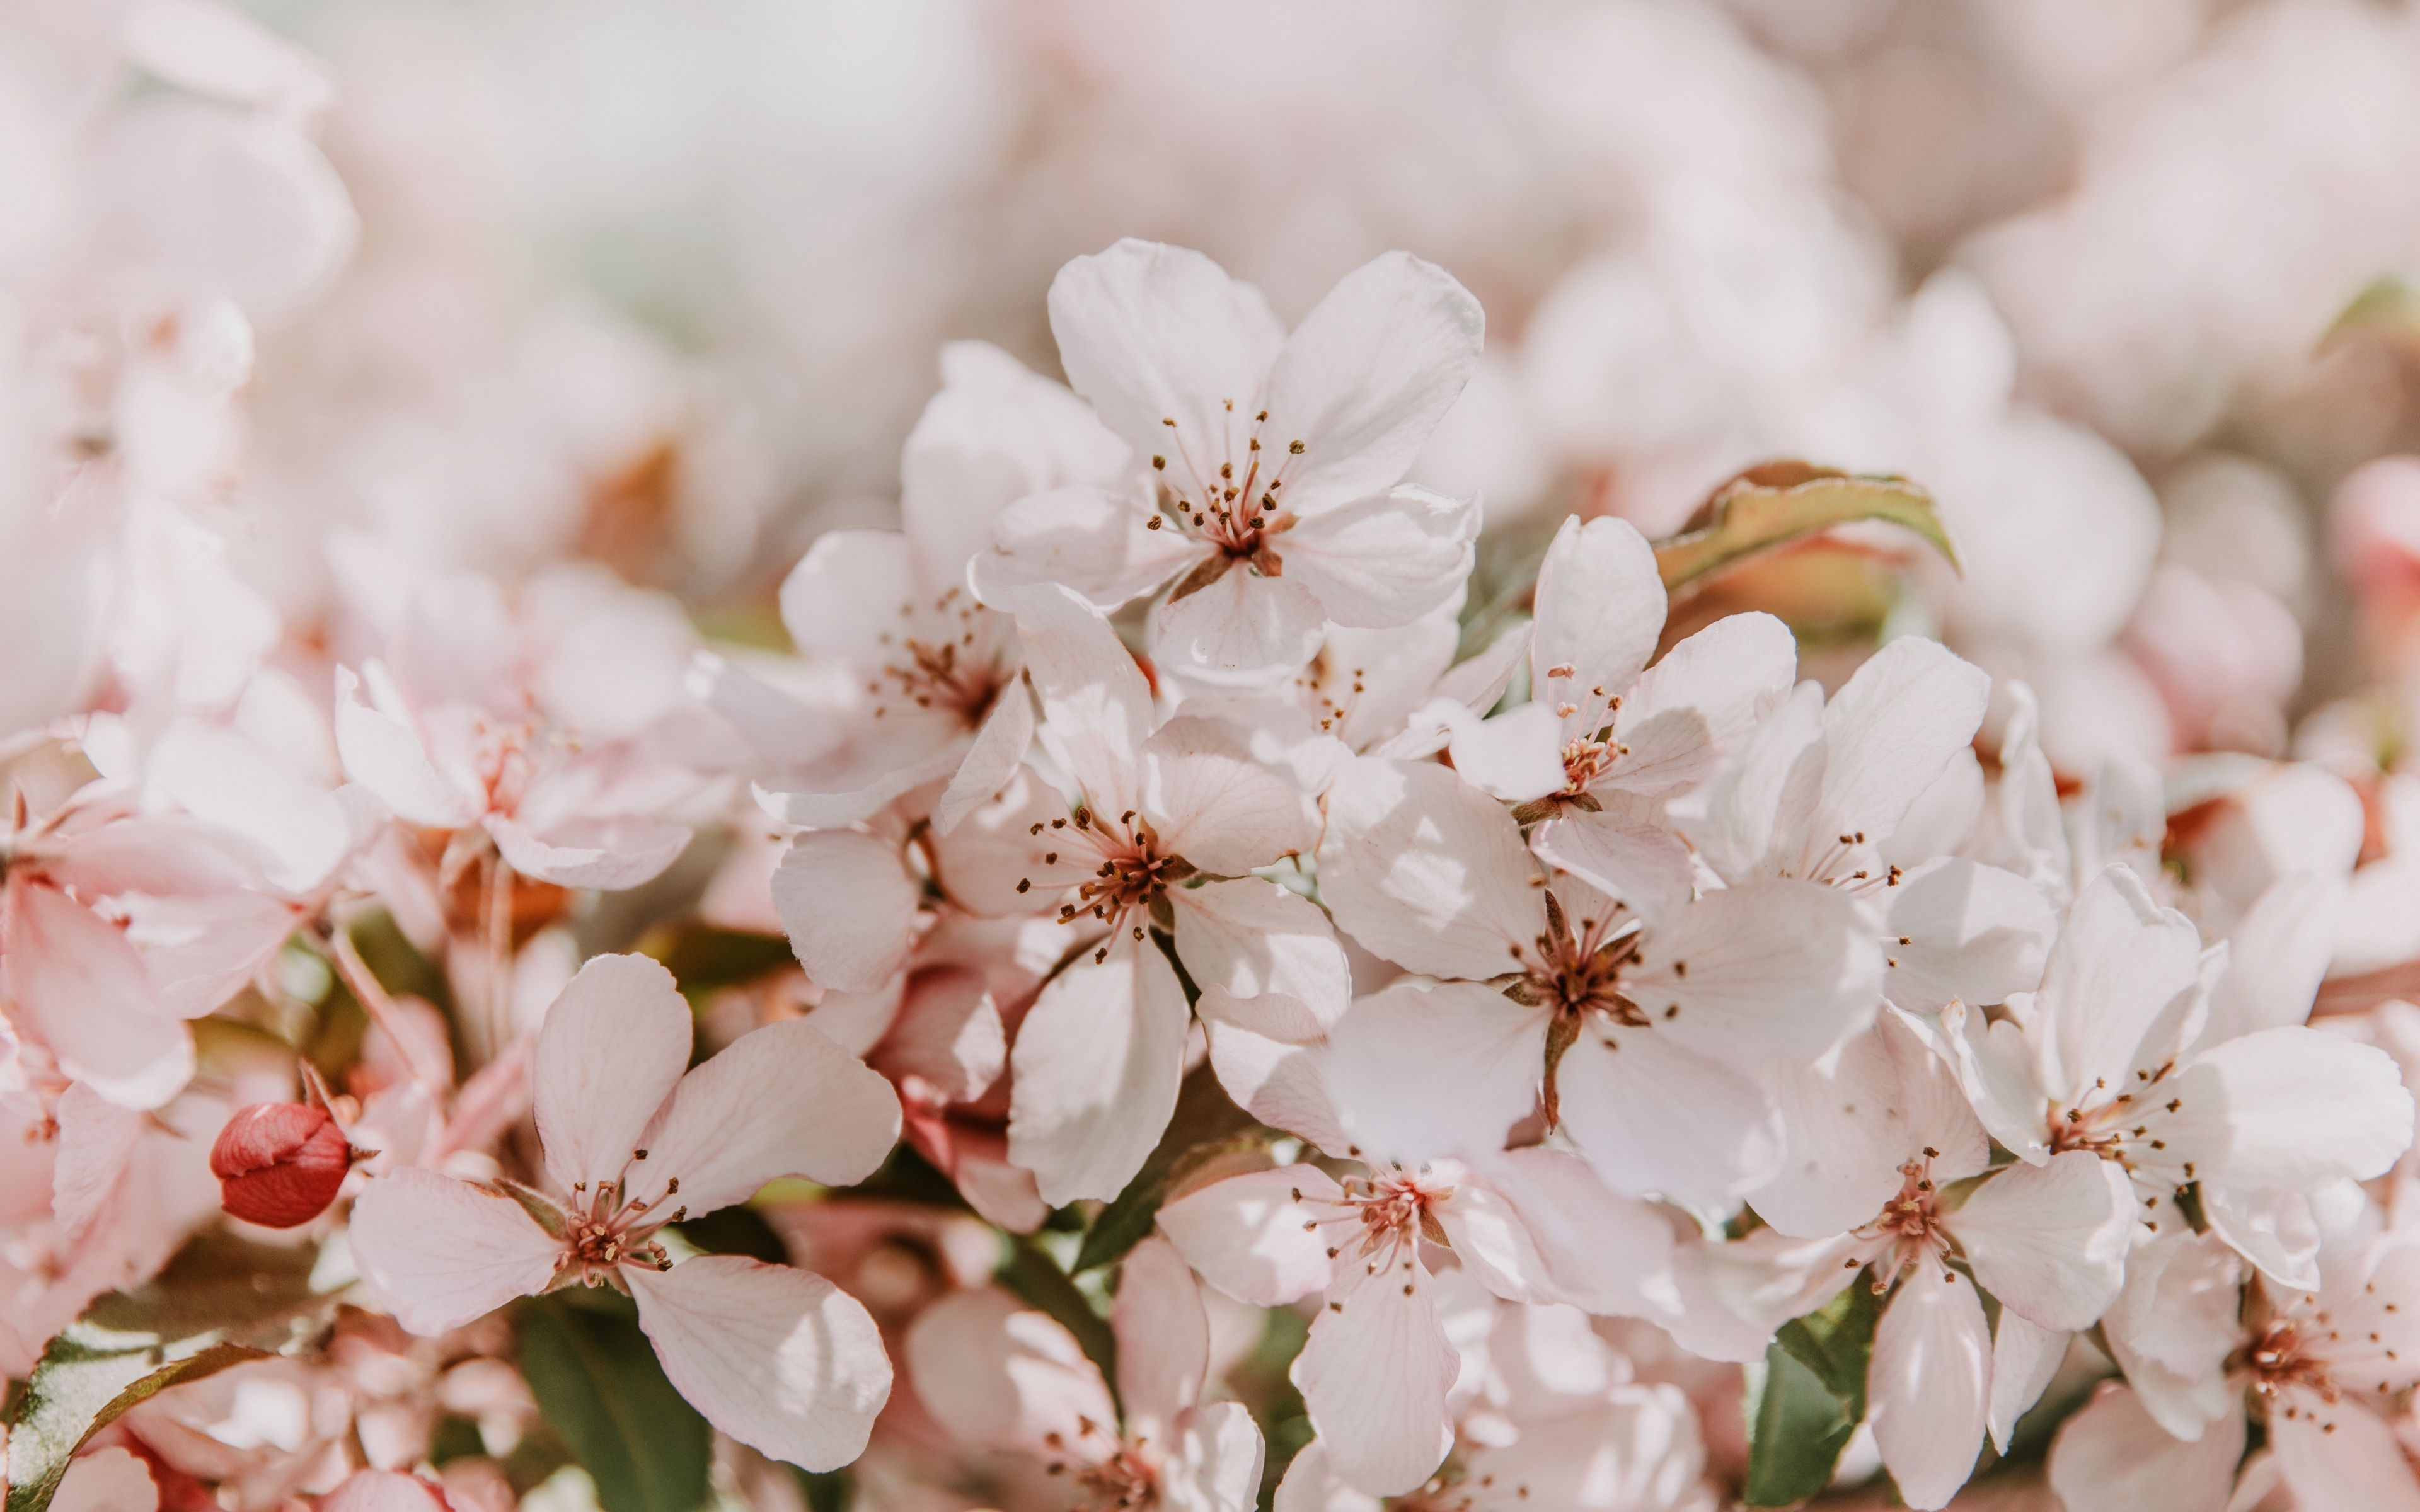 Spring Flowers Wallpaper Spring Flowers Wallpaper Hd Flower Wallpaper Flowers Photography Wallpaper